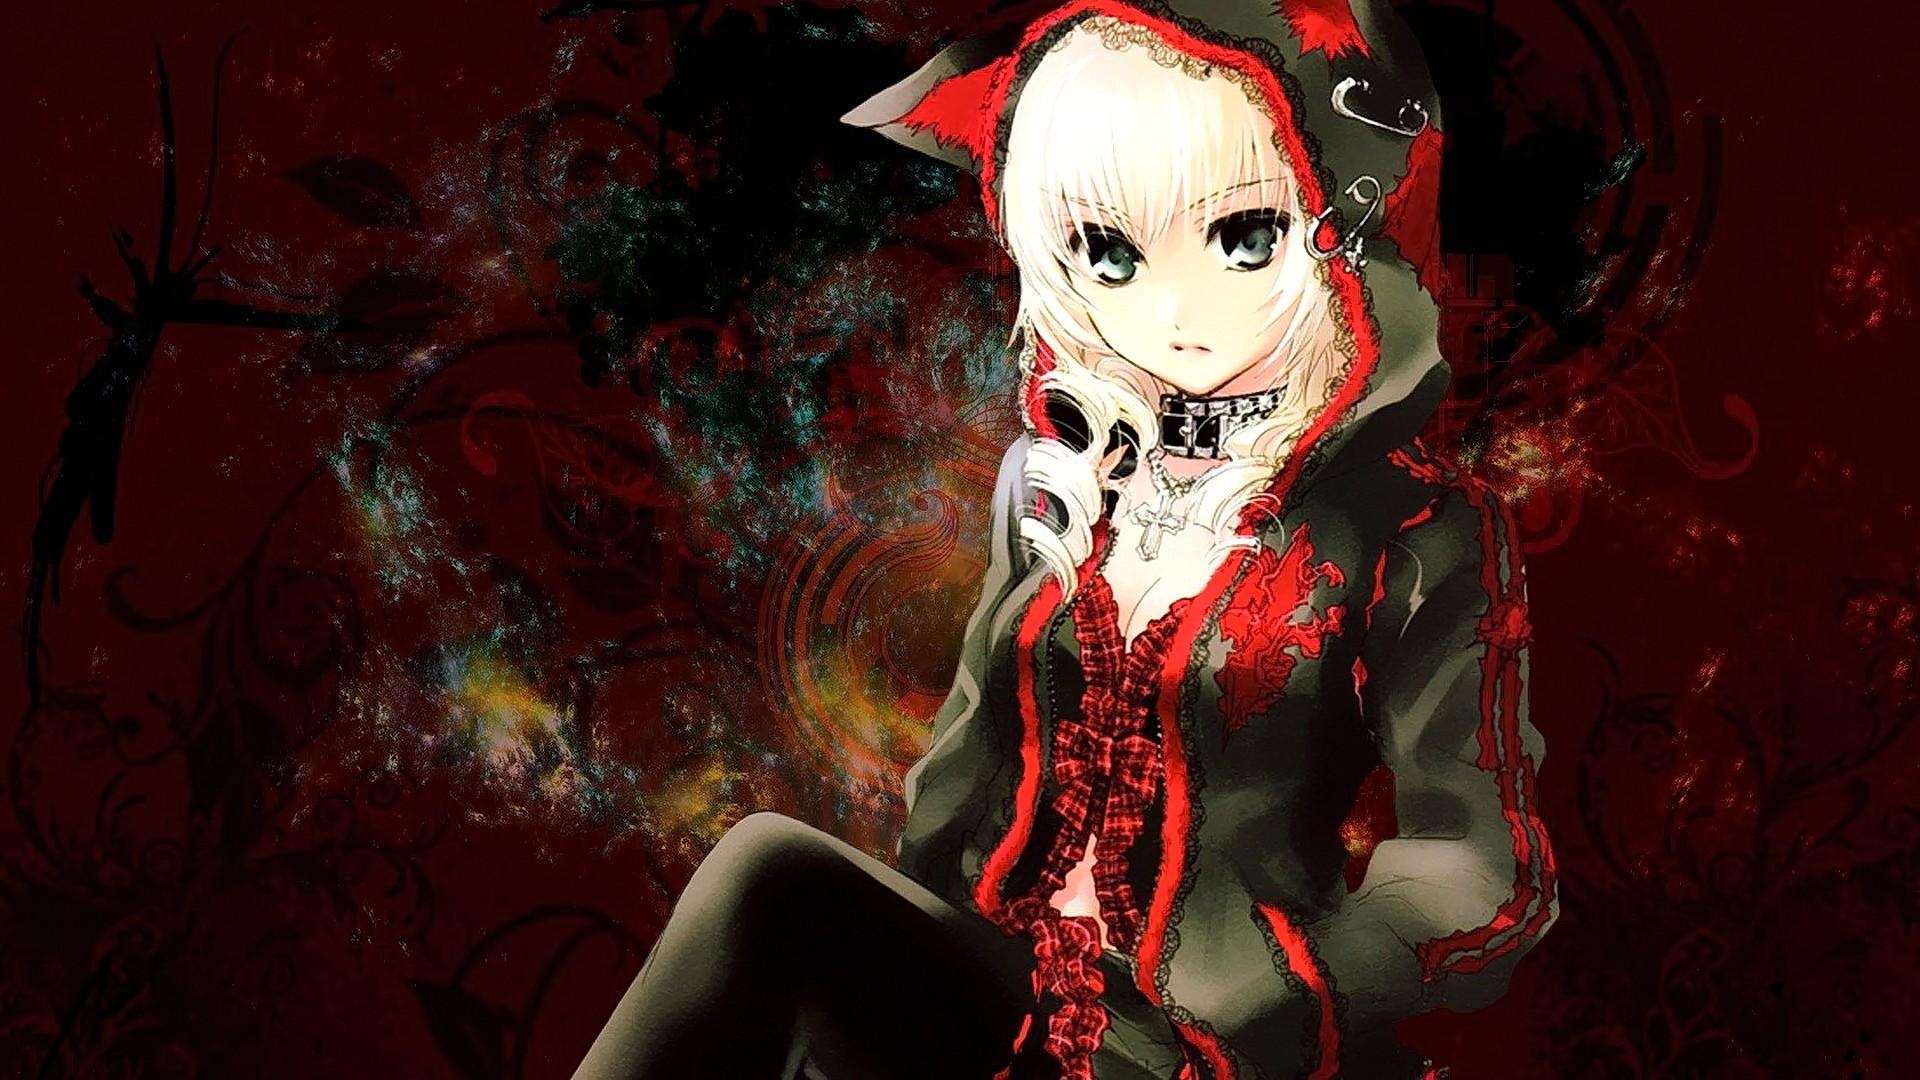 Фото аниме девушка в капюшоне с